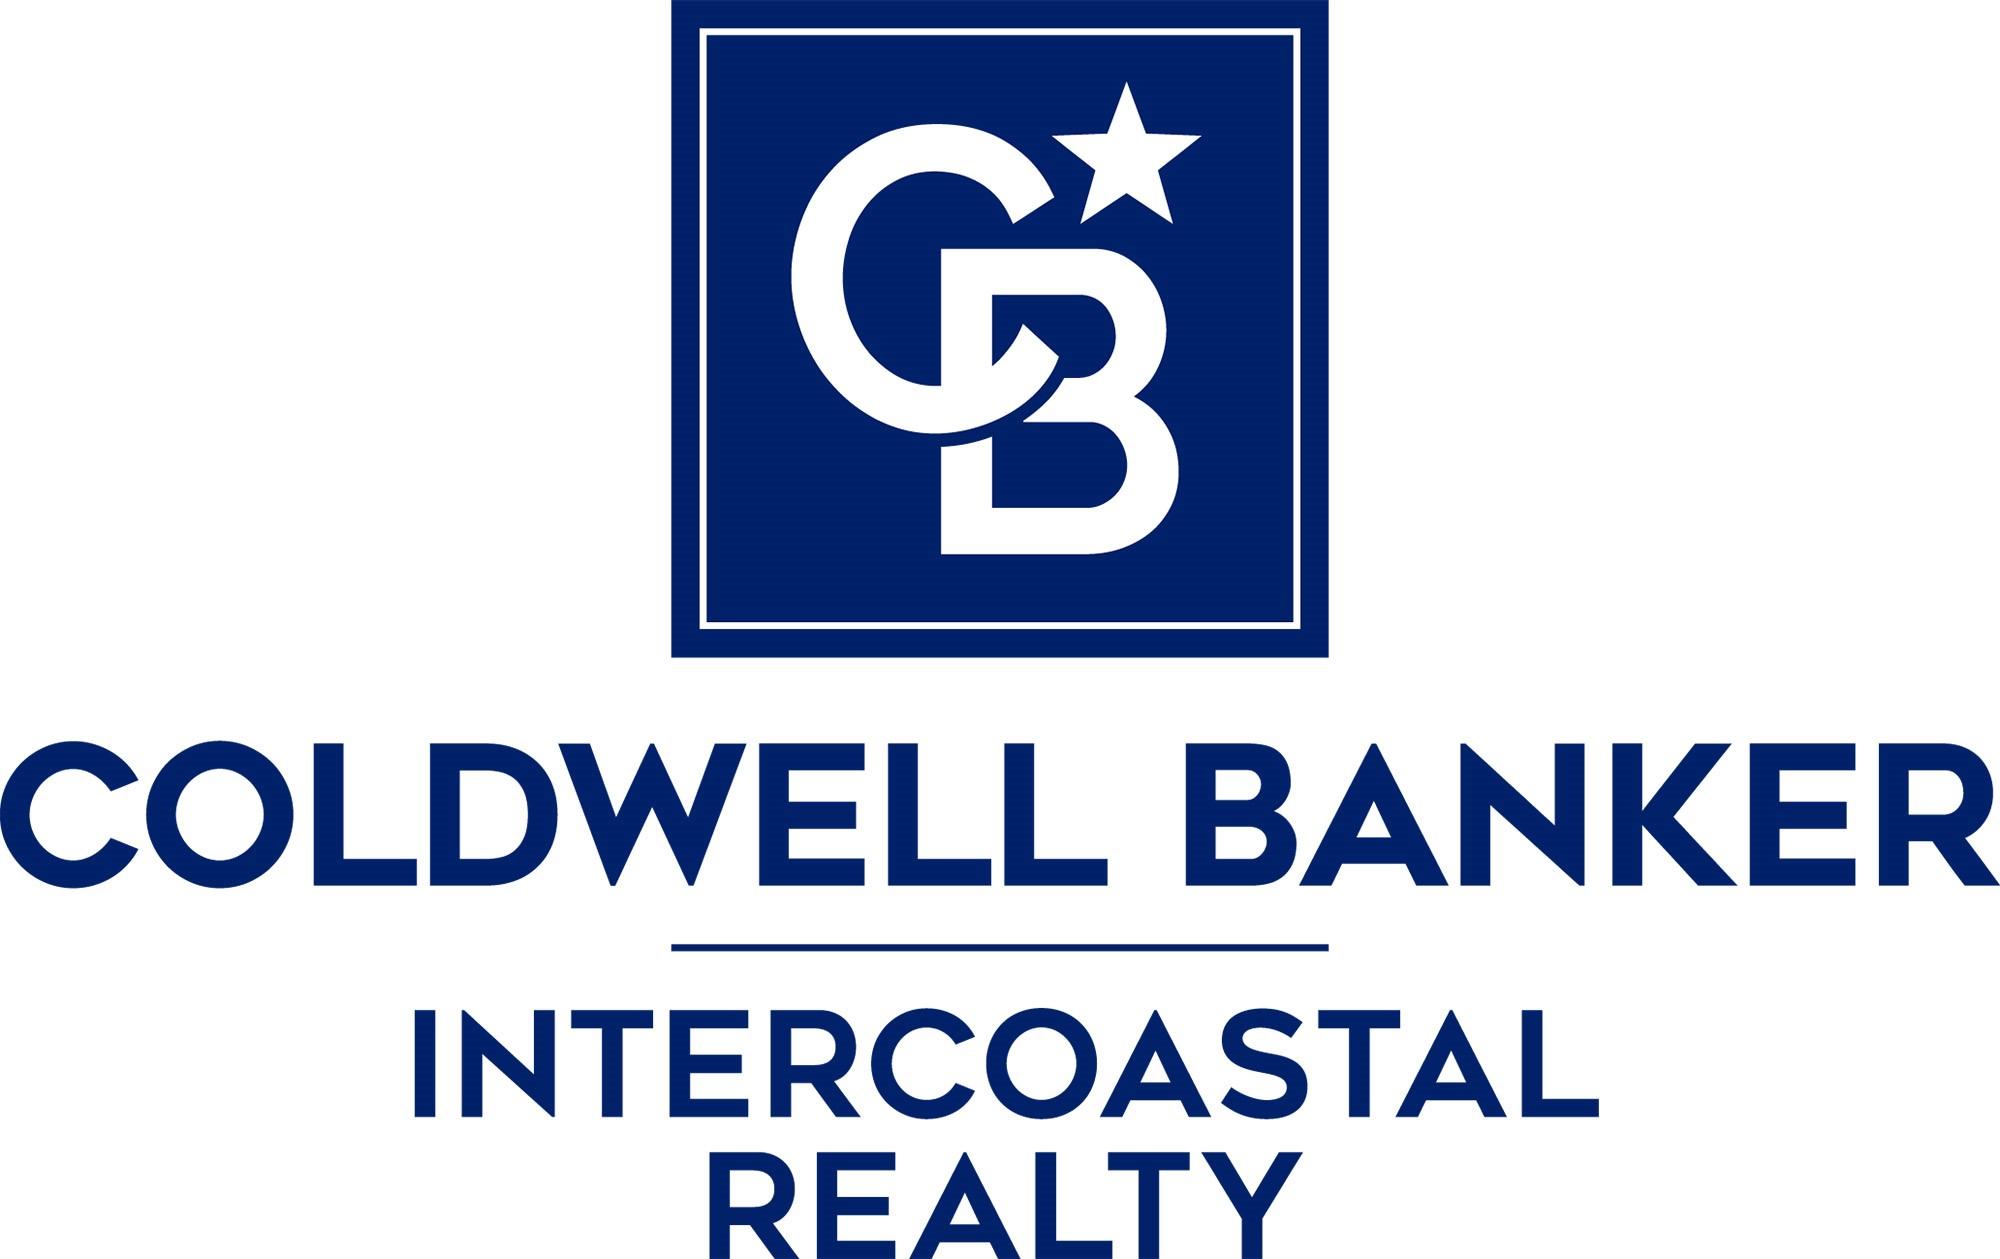 Coldwell Banker Intercoastal Realty